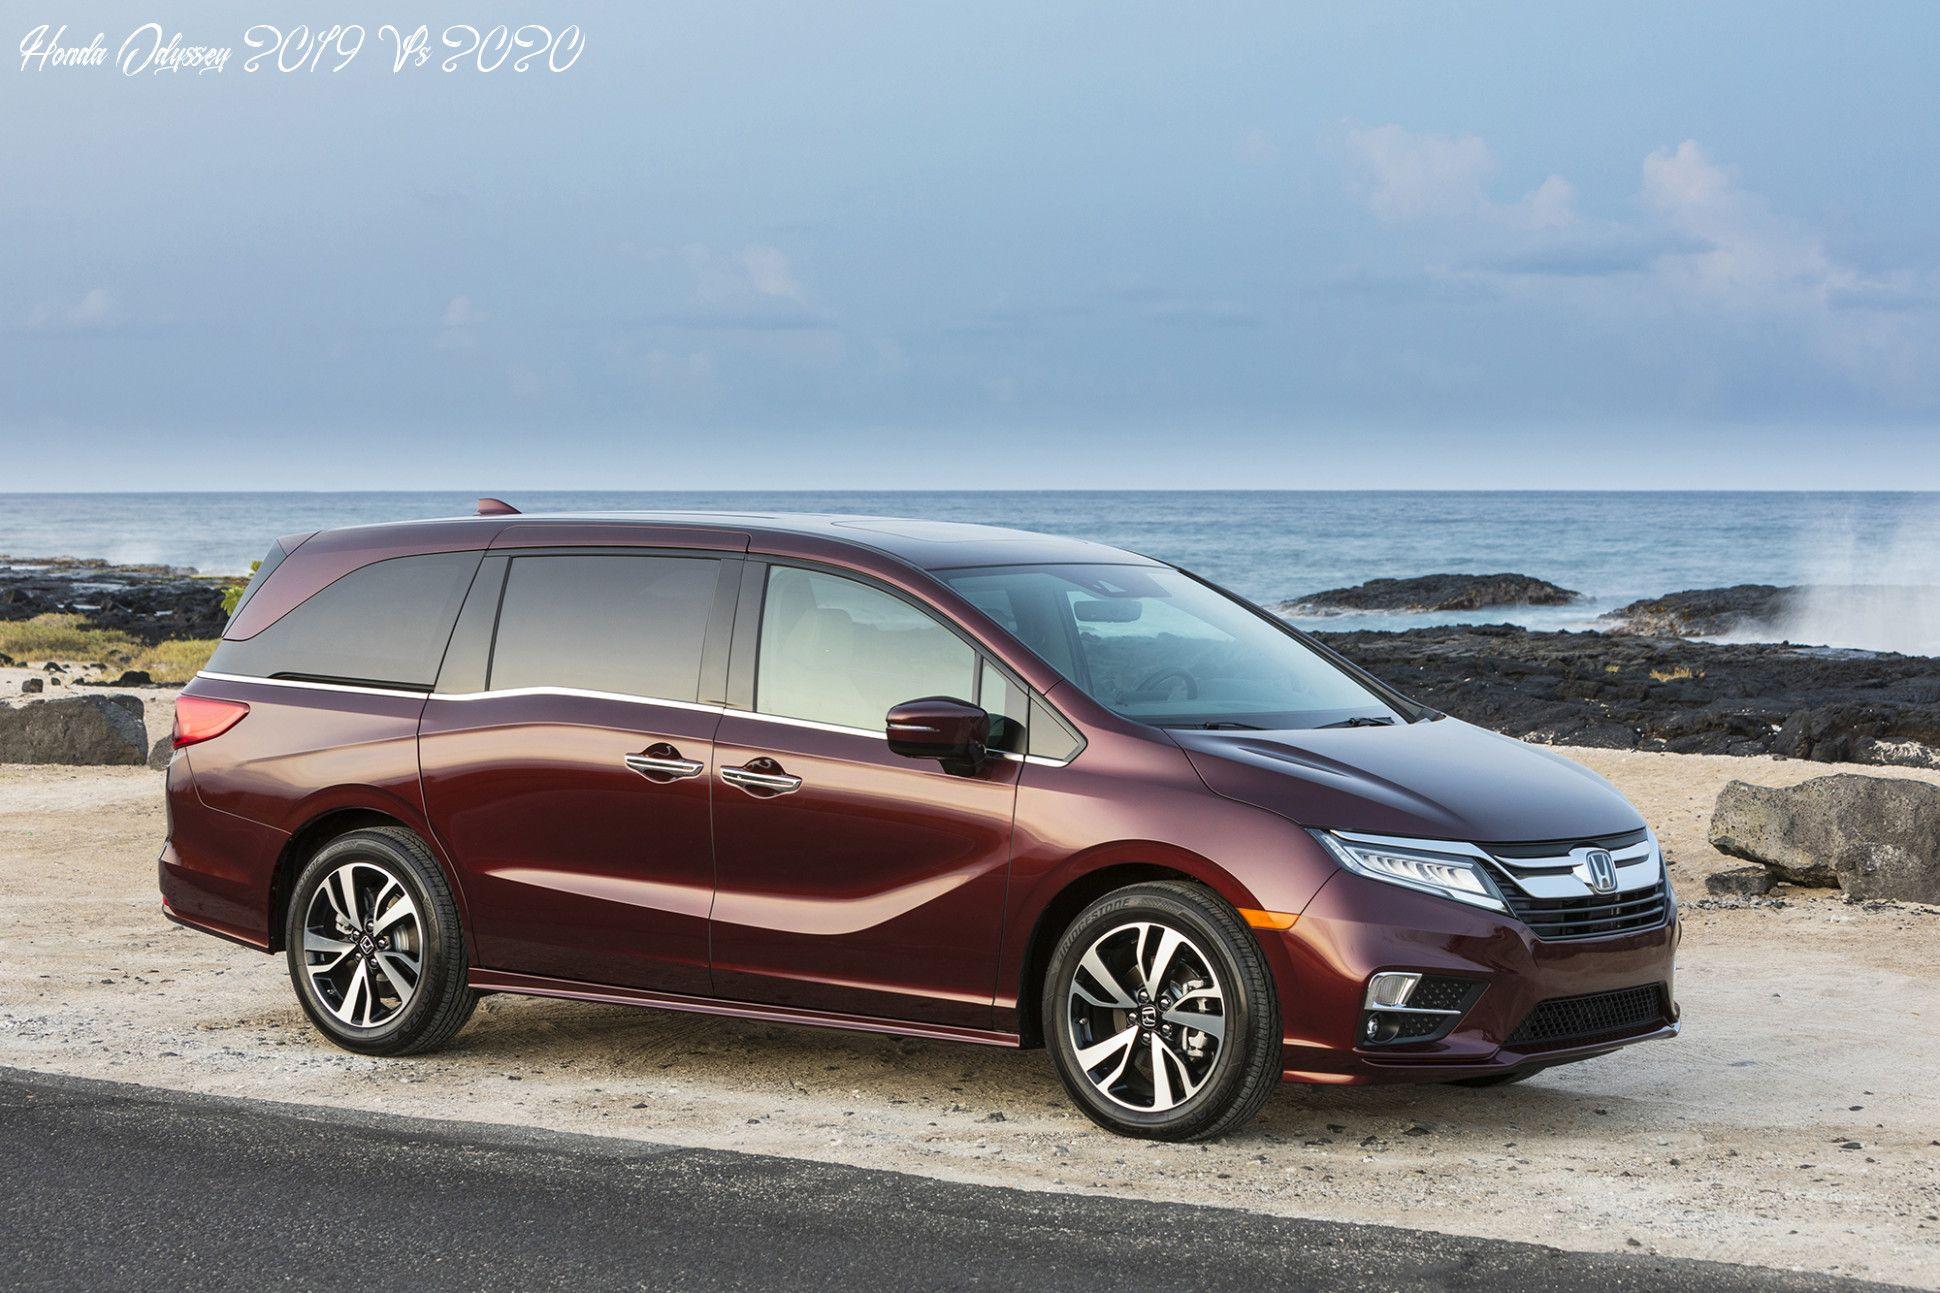 Honda Odyssey 2019 Vs 2020 New Concept In 2020 Honda Odyssey Honda Odyssey Touring Elite Honda Odyssey Touring